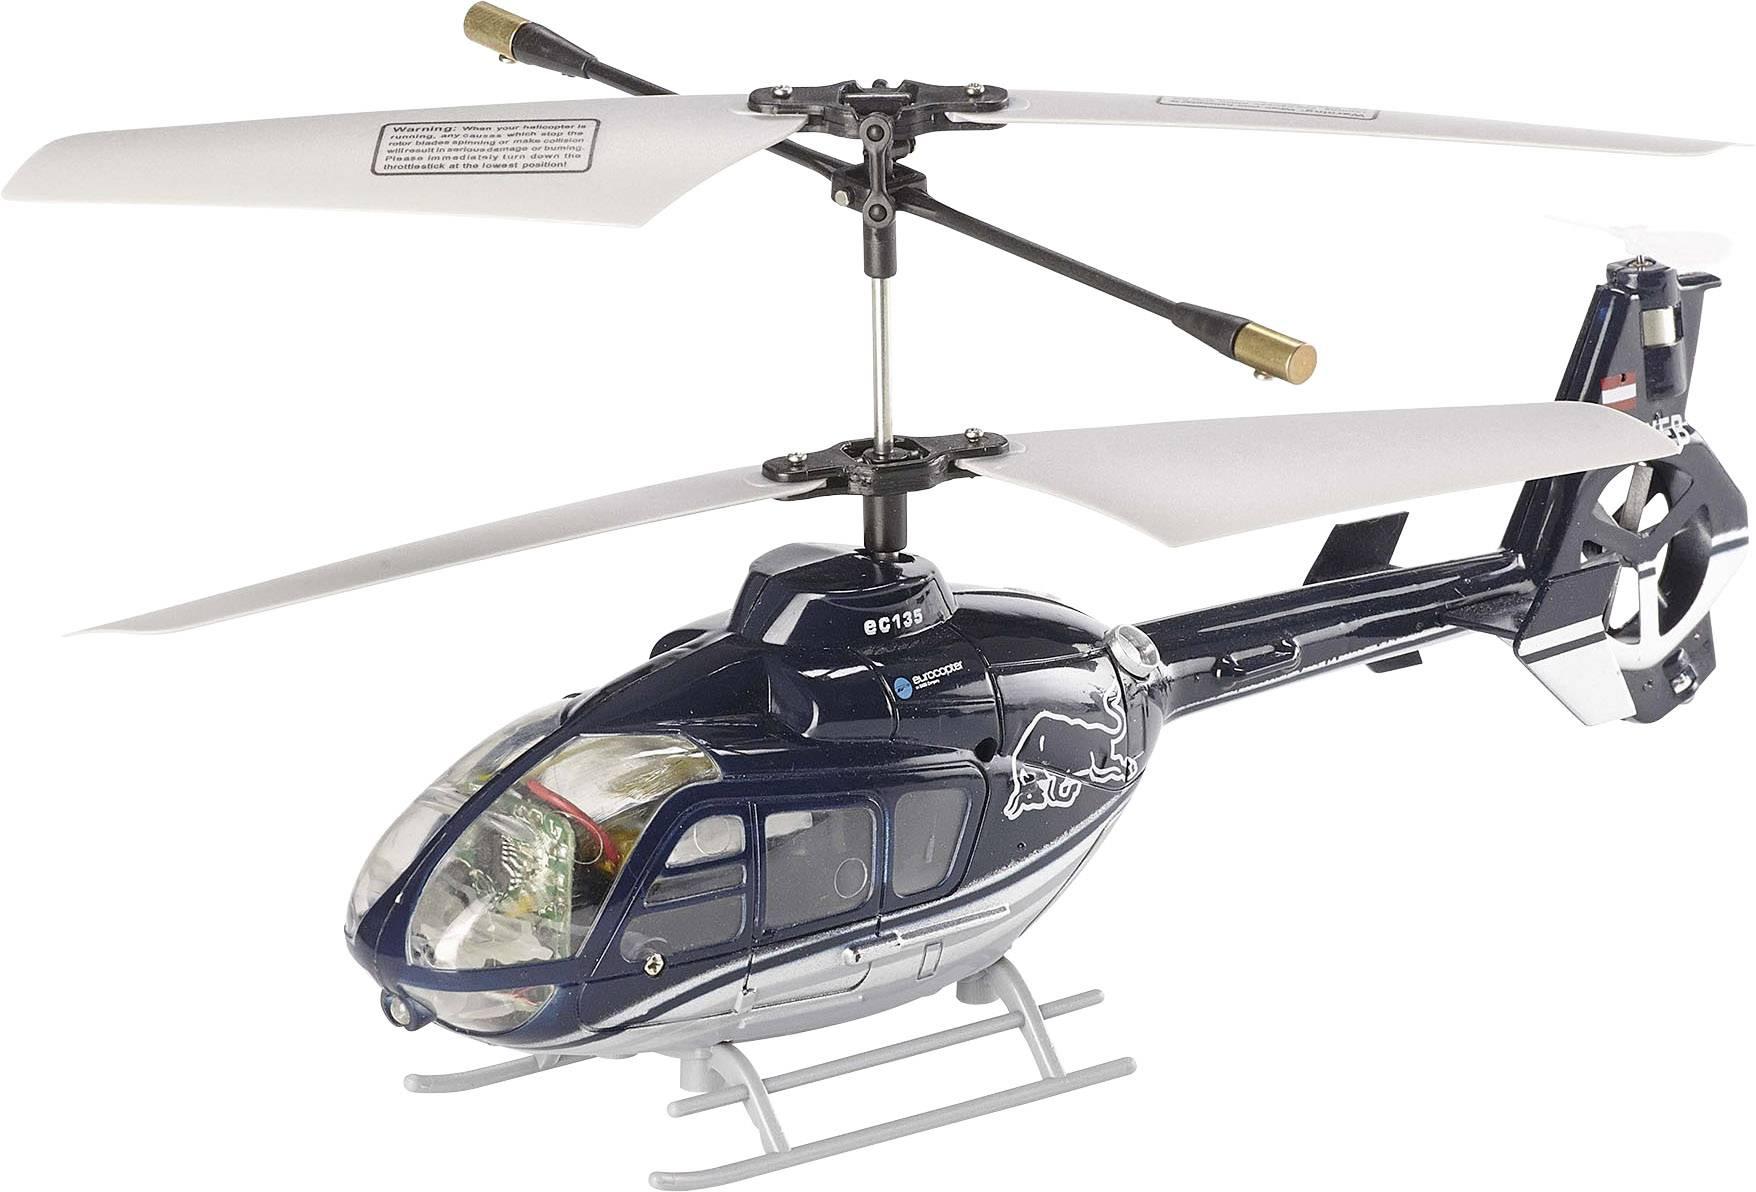 RC vrtuľník Revell Control EC135 Flying Bulls, RtF